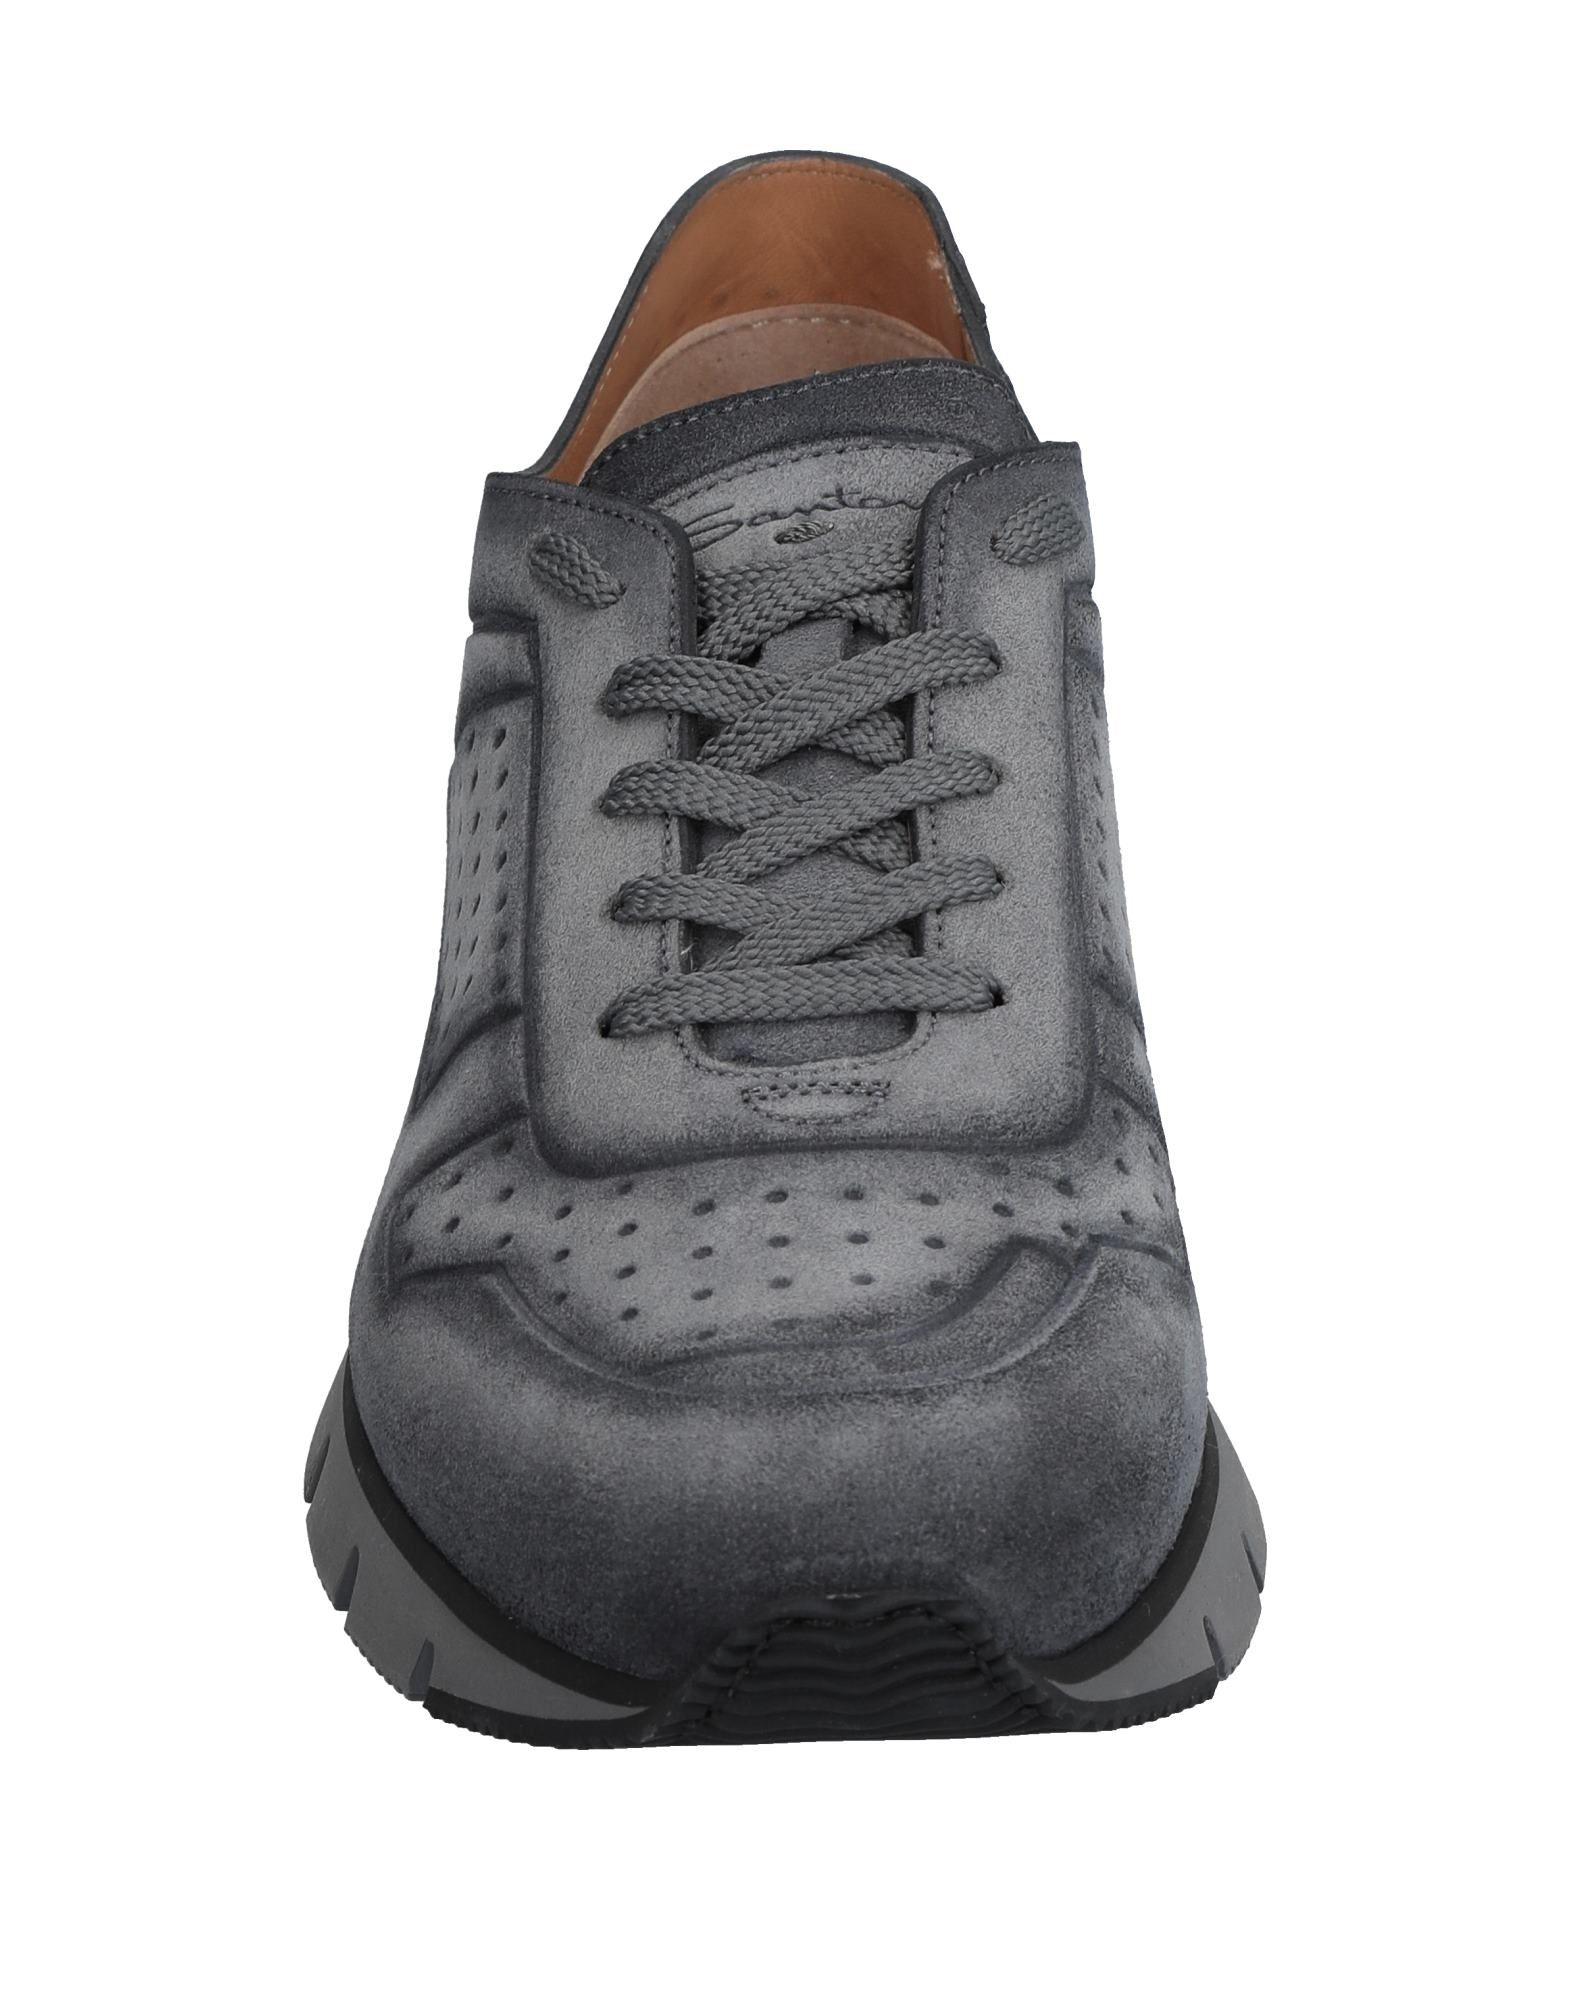 Santoni Sneakers Herren  11541936EB Schuhe Gute Qualität beliebte Schuhe 11541936EB e475d4